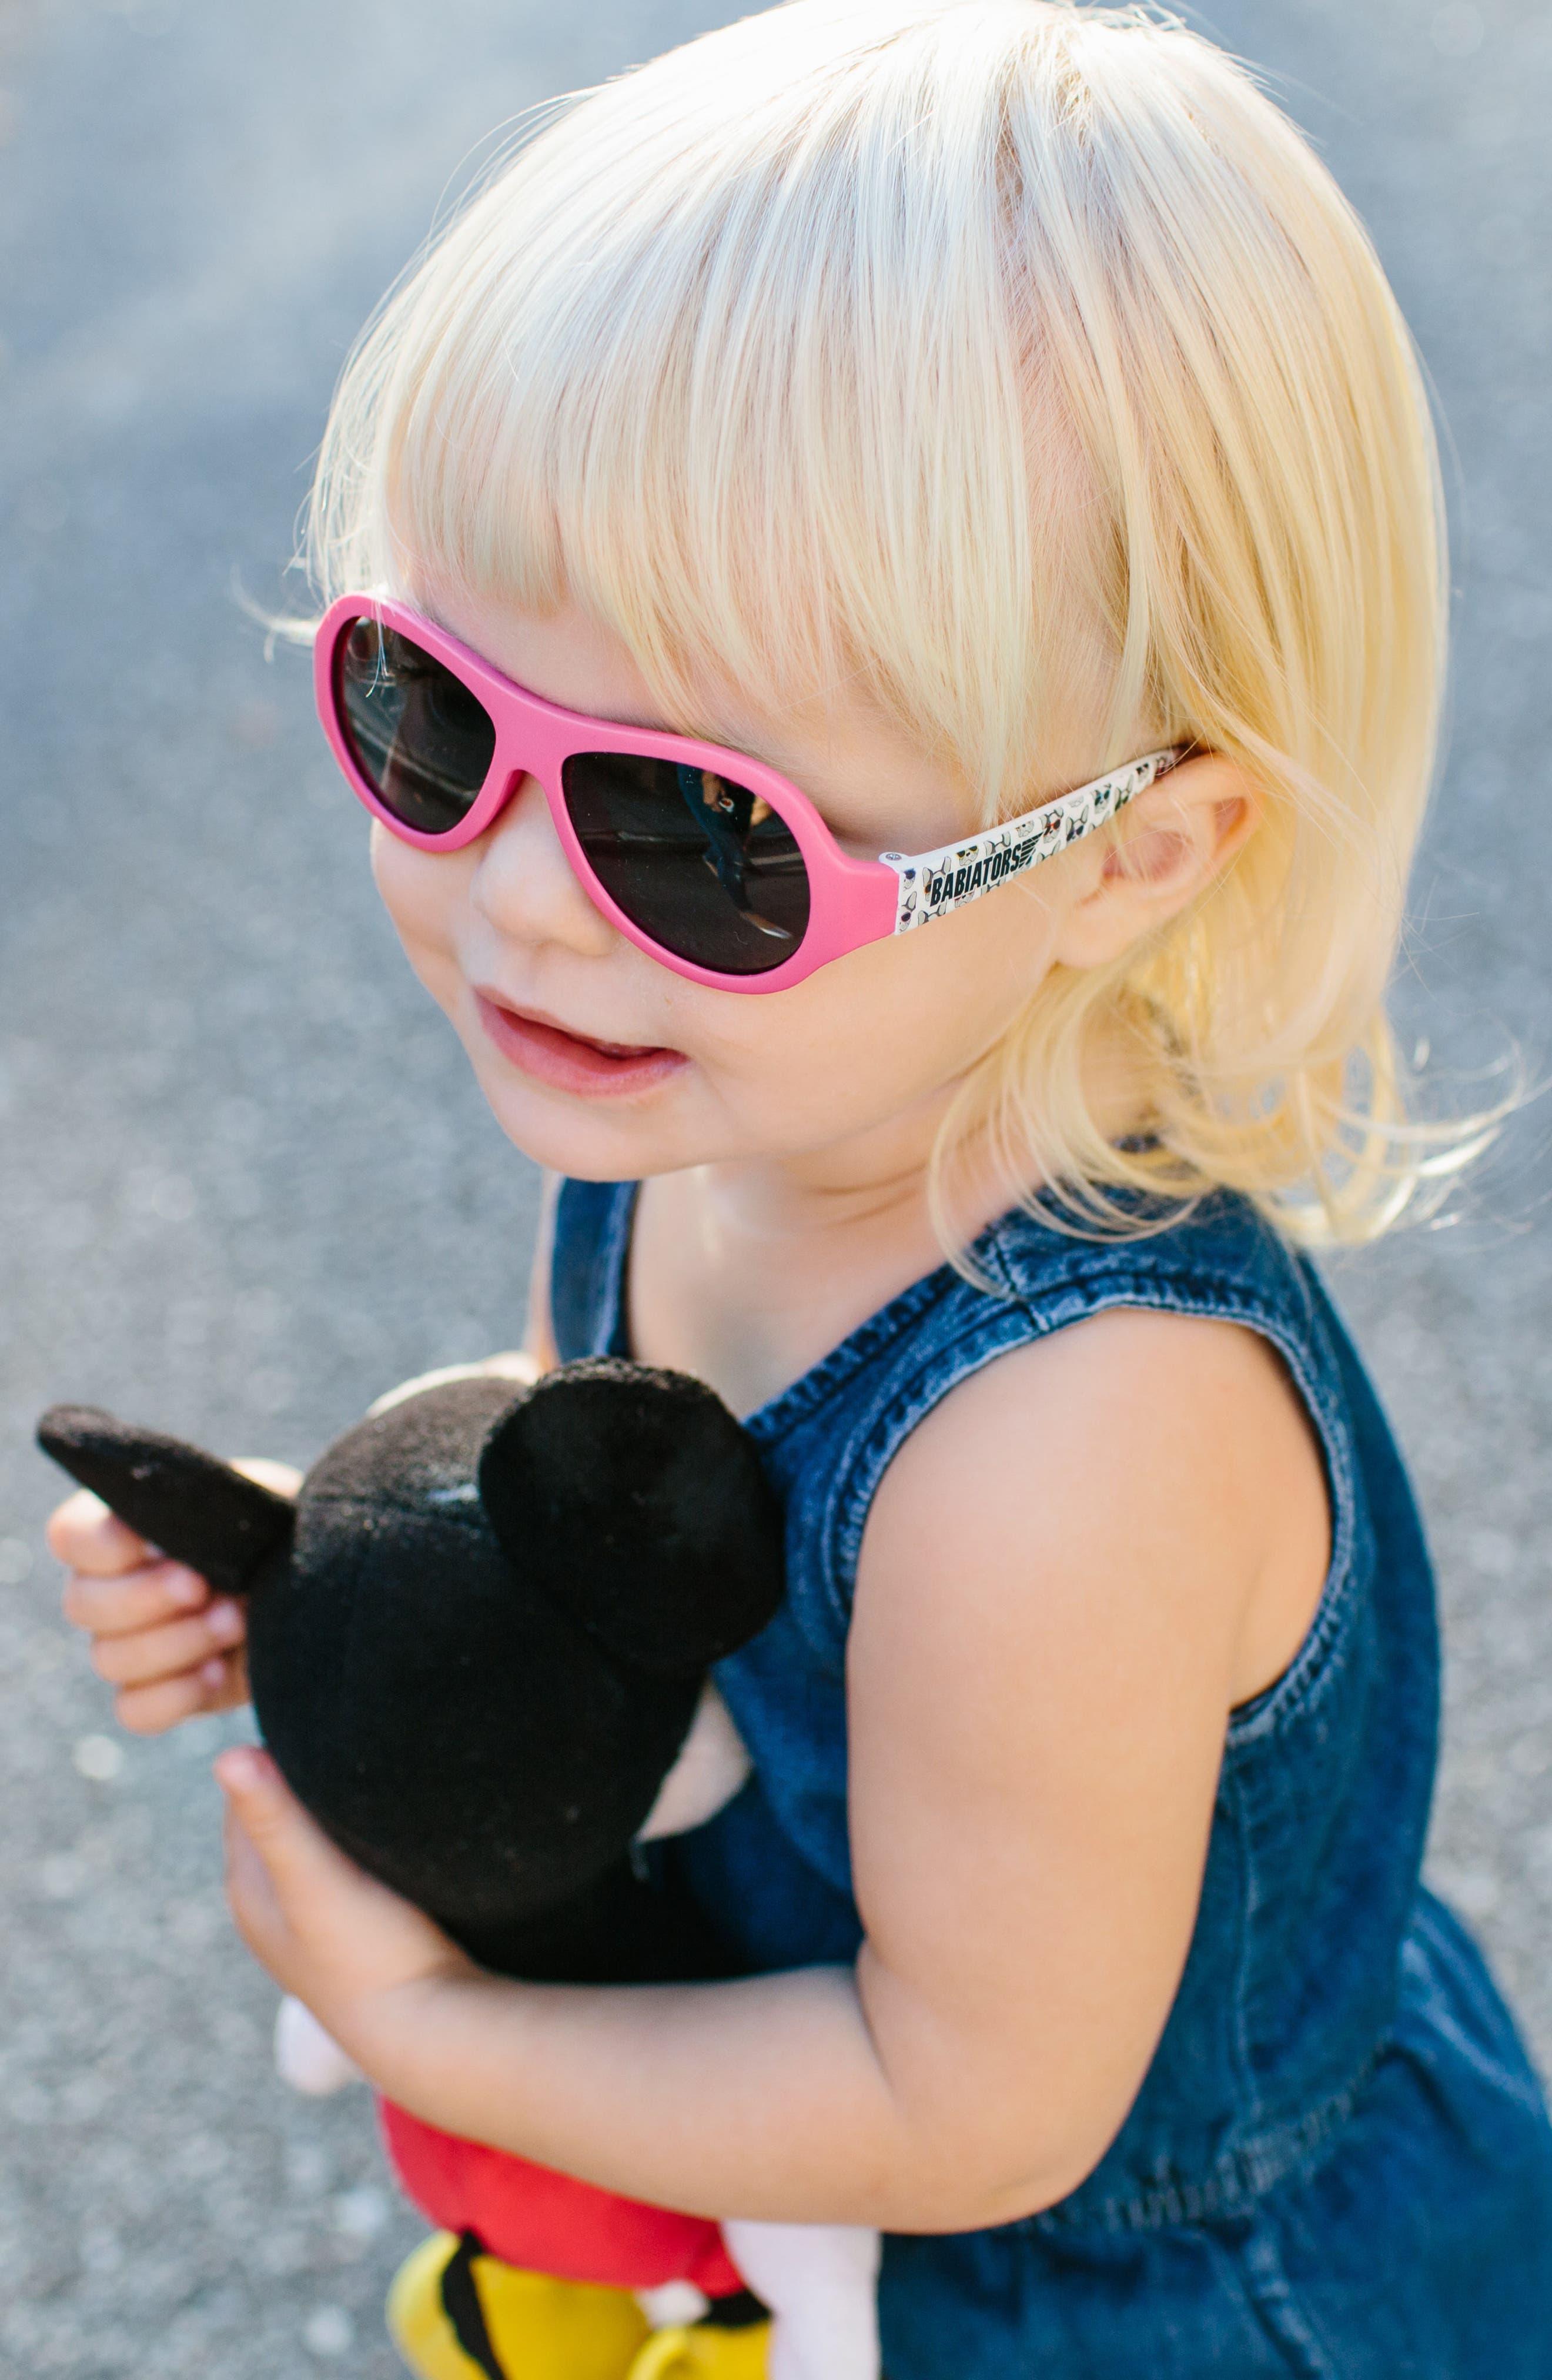 Puppy Print Polarized Aviator Sunglasses,                             Alternate thumbnail 7, color,                             PUPPY LOVE